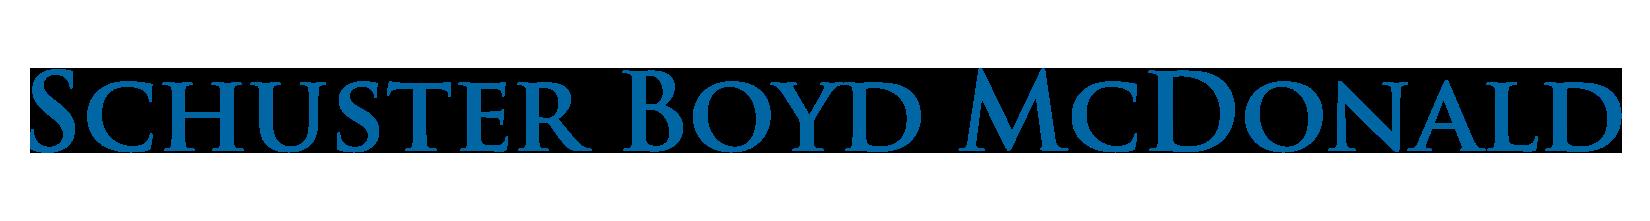 SCHUSTER BOYD McDONALD